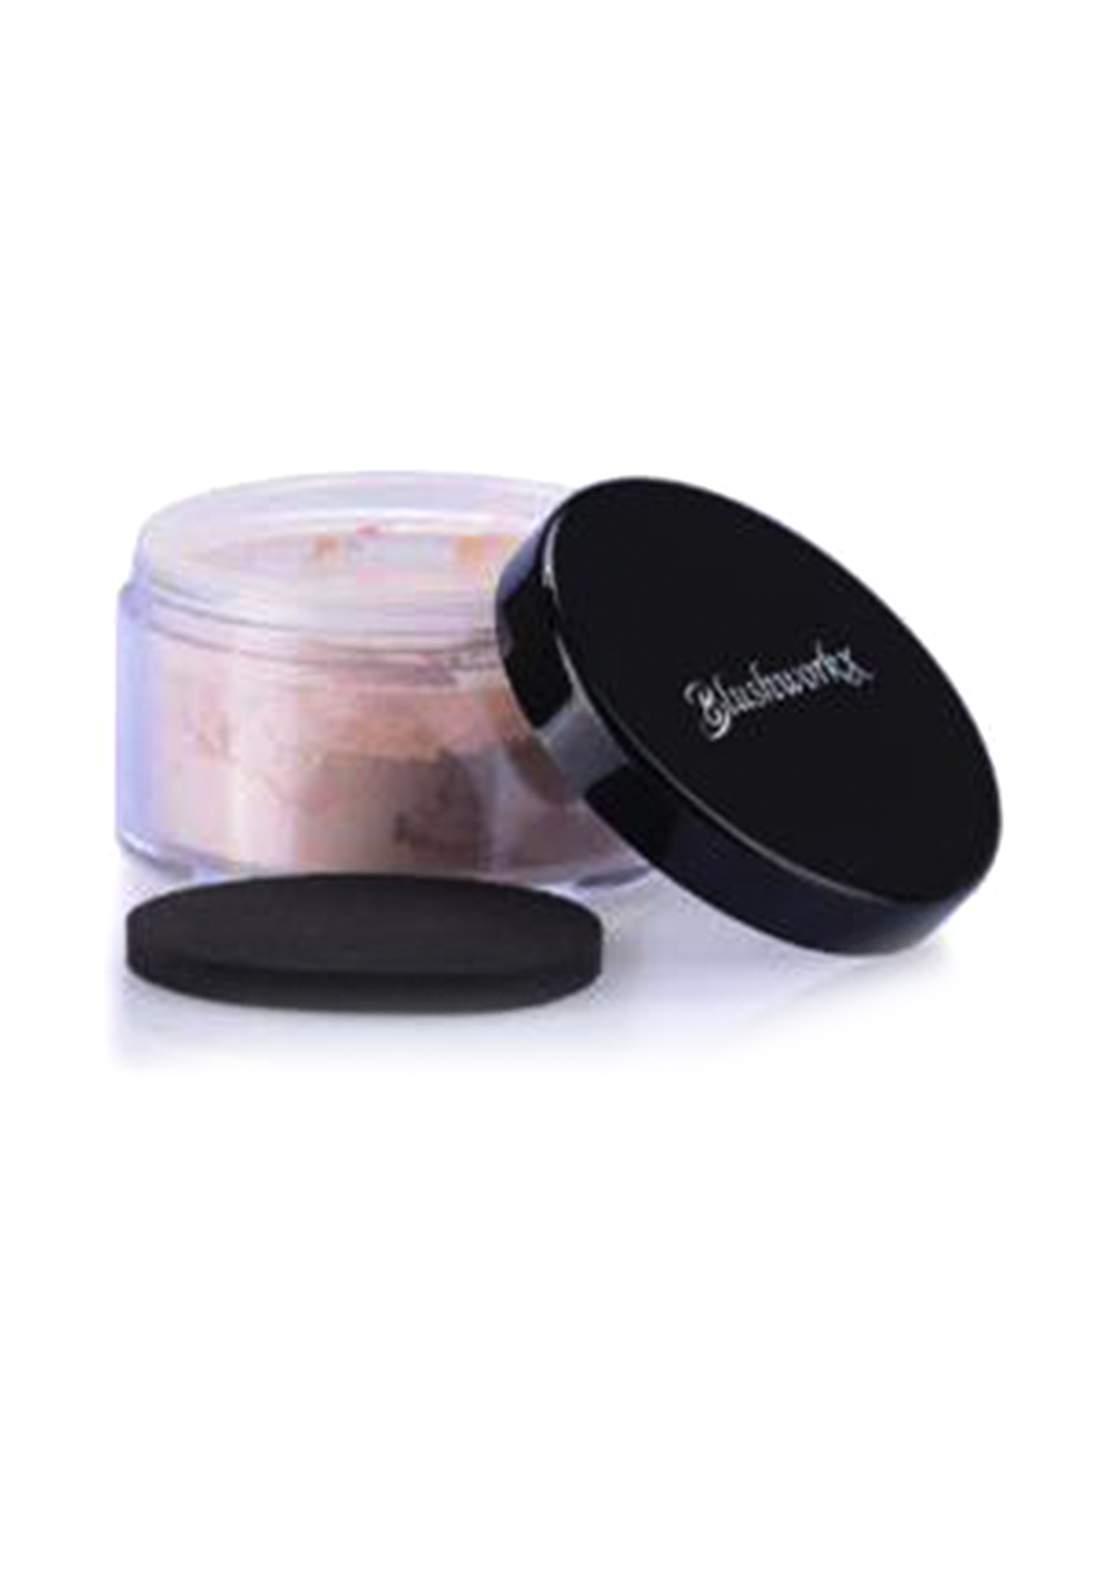 Blushworkx Hollywood Loose Mineral Powder  Foundation SPF 15 7g Nude لوس باودر مع واقي شمس